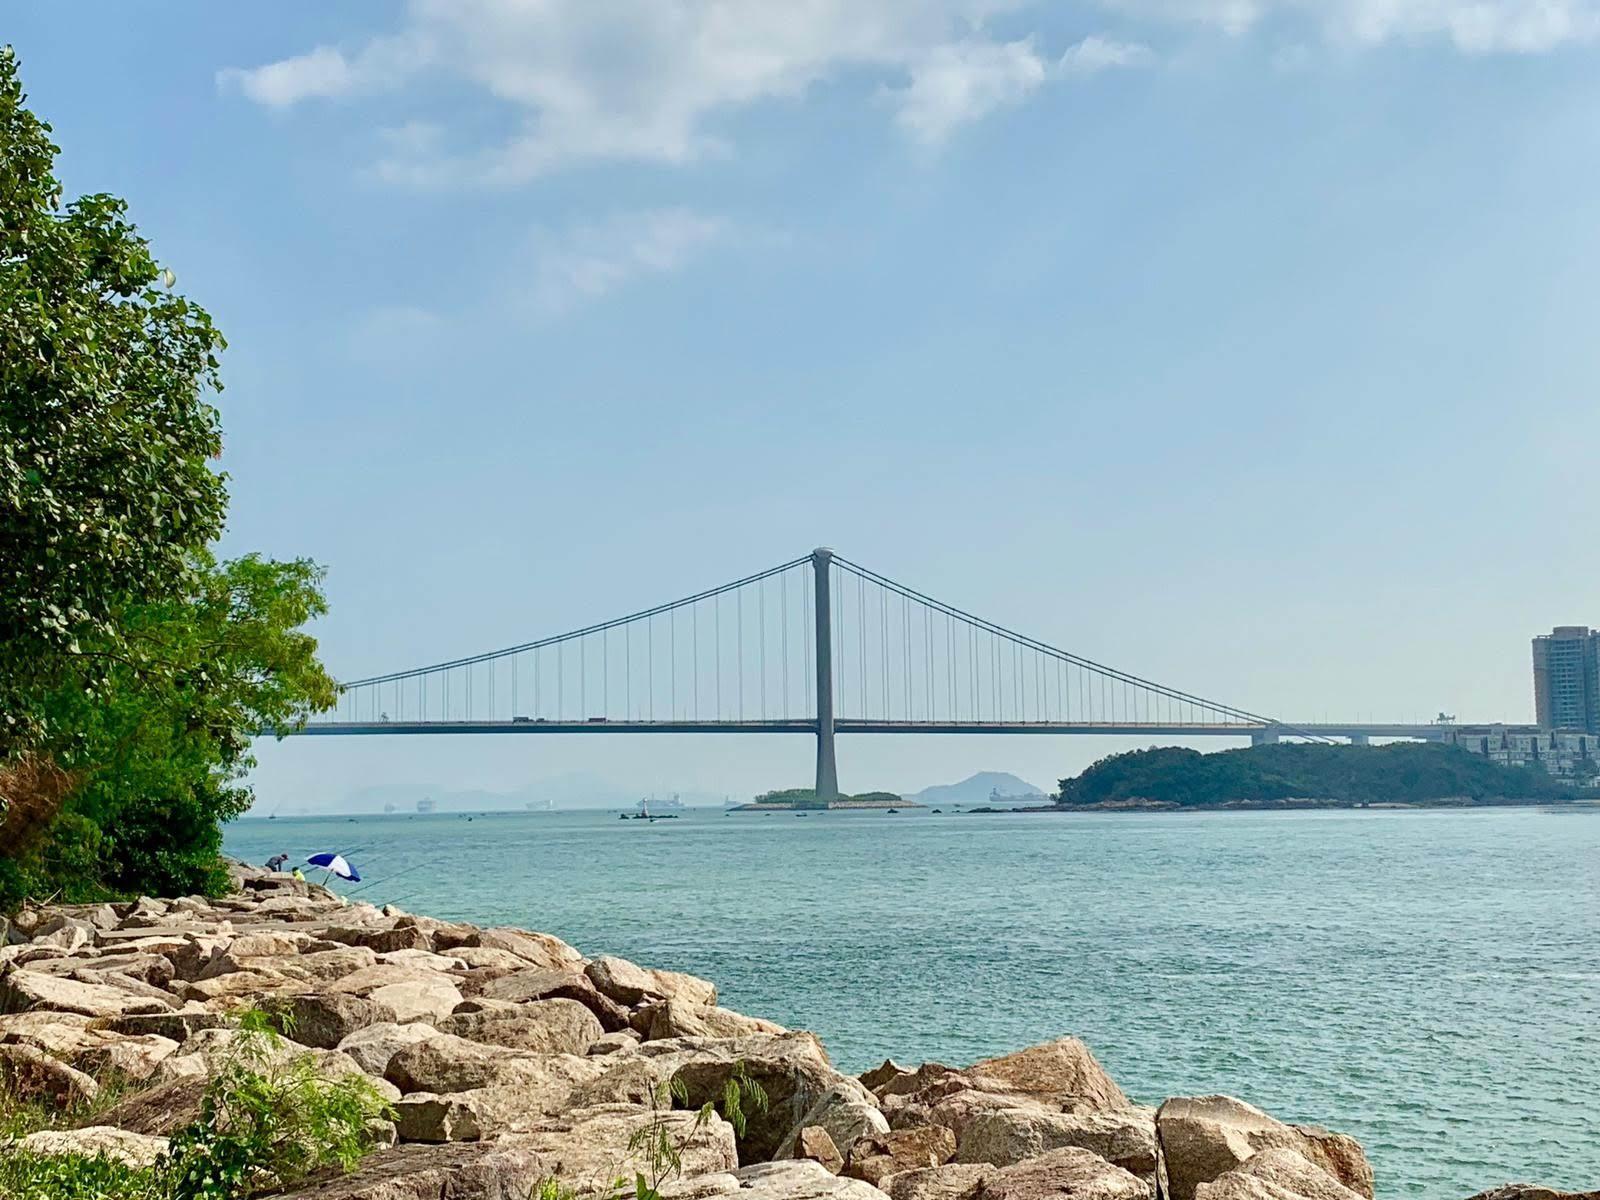 blue sky, long bridge, sea, rocky shore